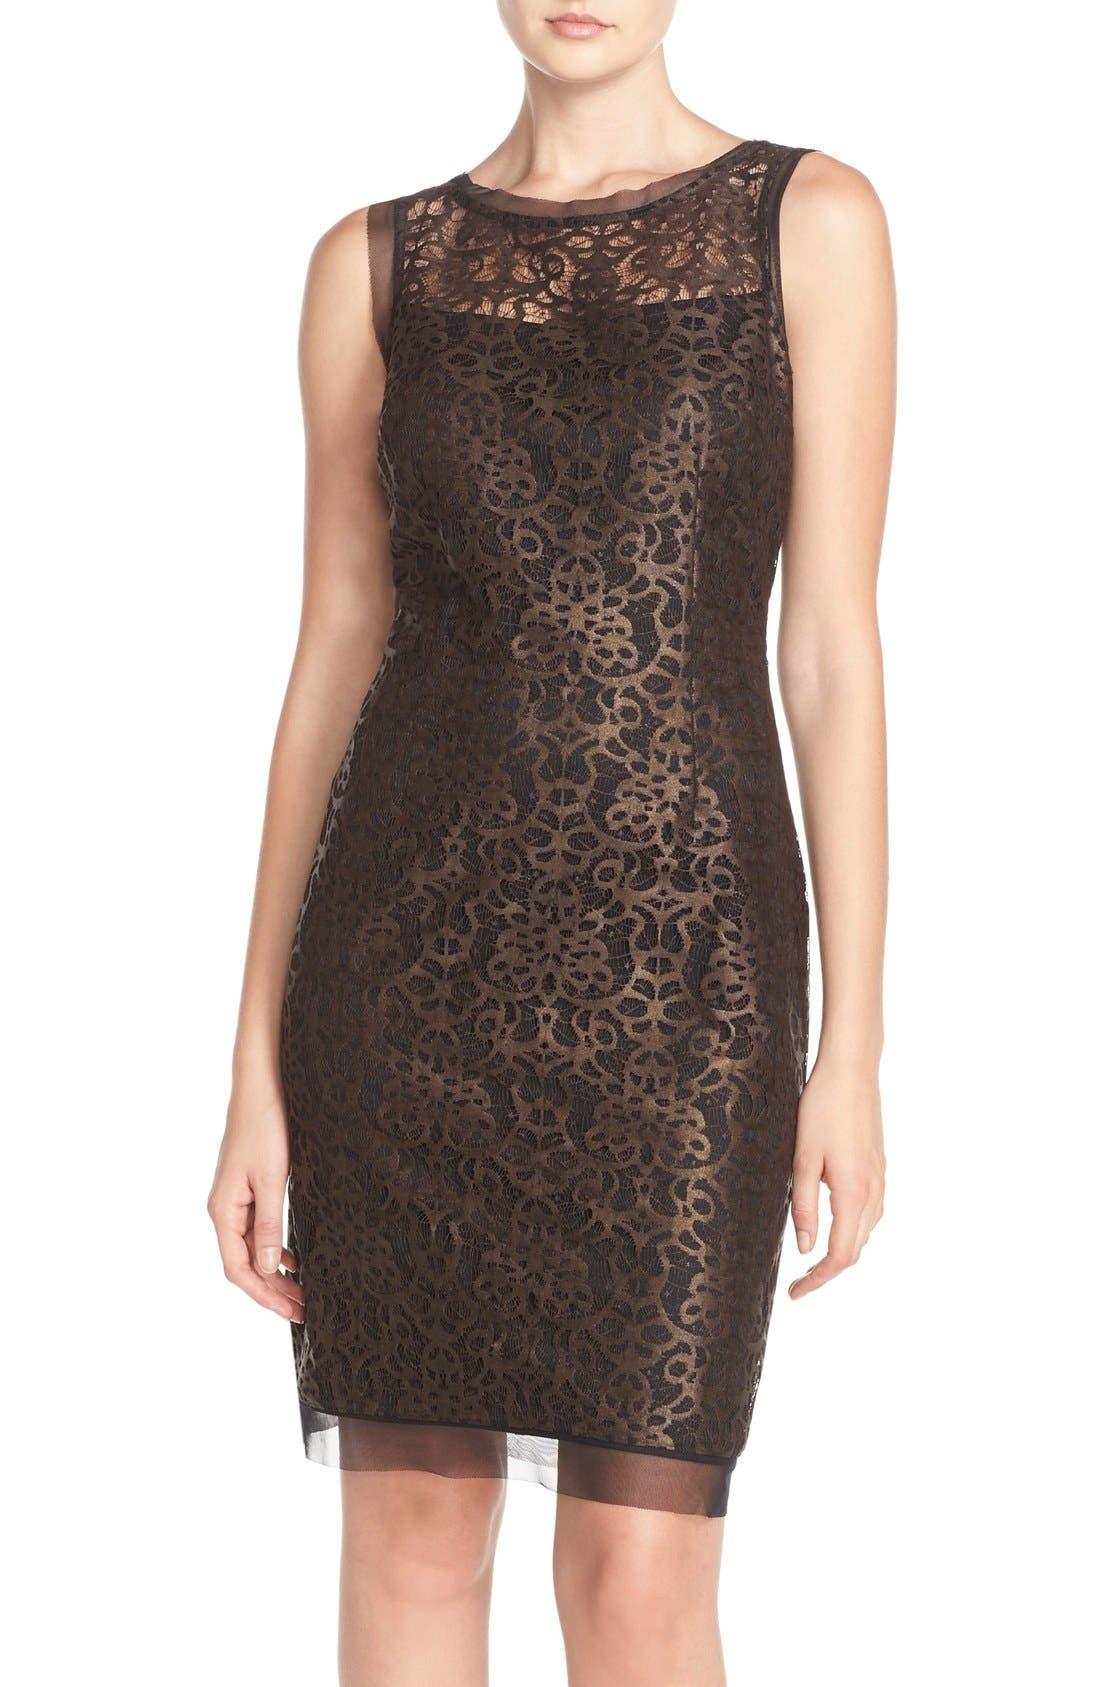 Alternate Image 1 Selected - Julia Jordan Metallic Lace Sheath Dress